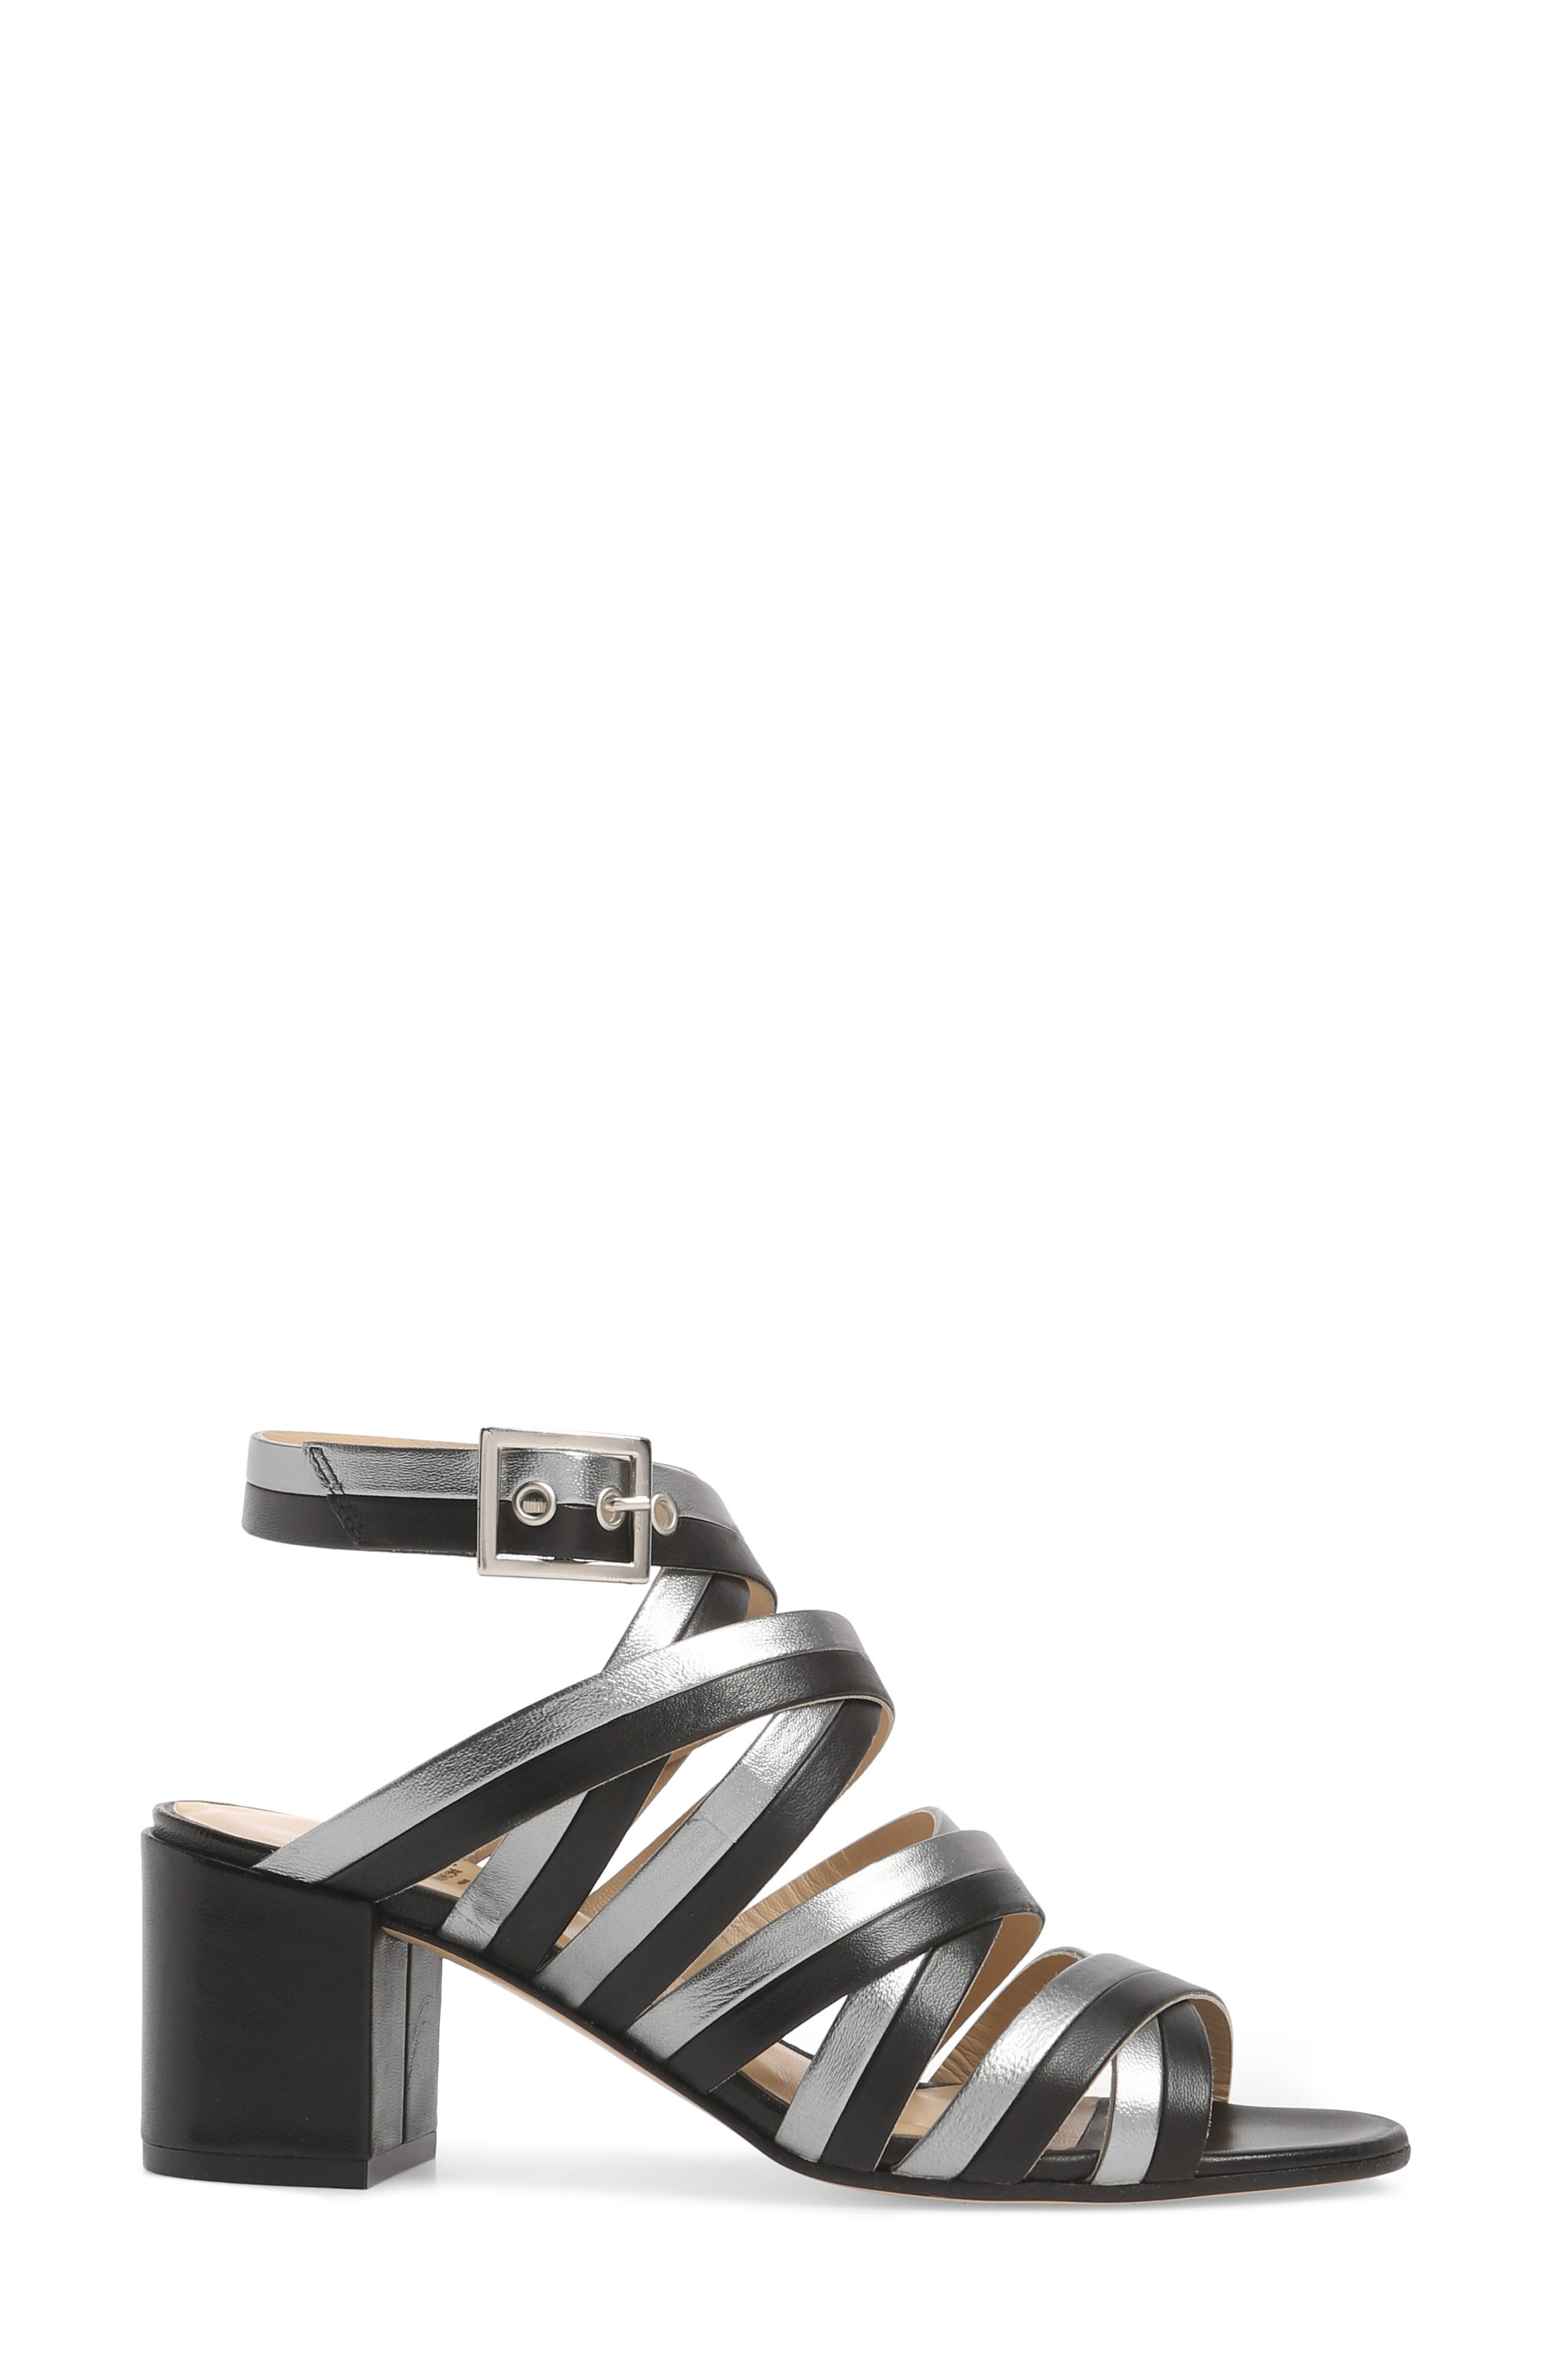 Leda Strappy Sandal,                             Alternate thumbnail 3, color,                             BLACK LEATHER